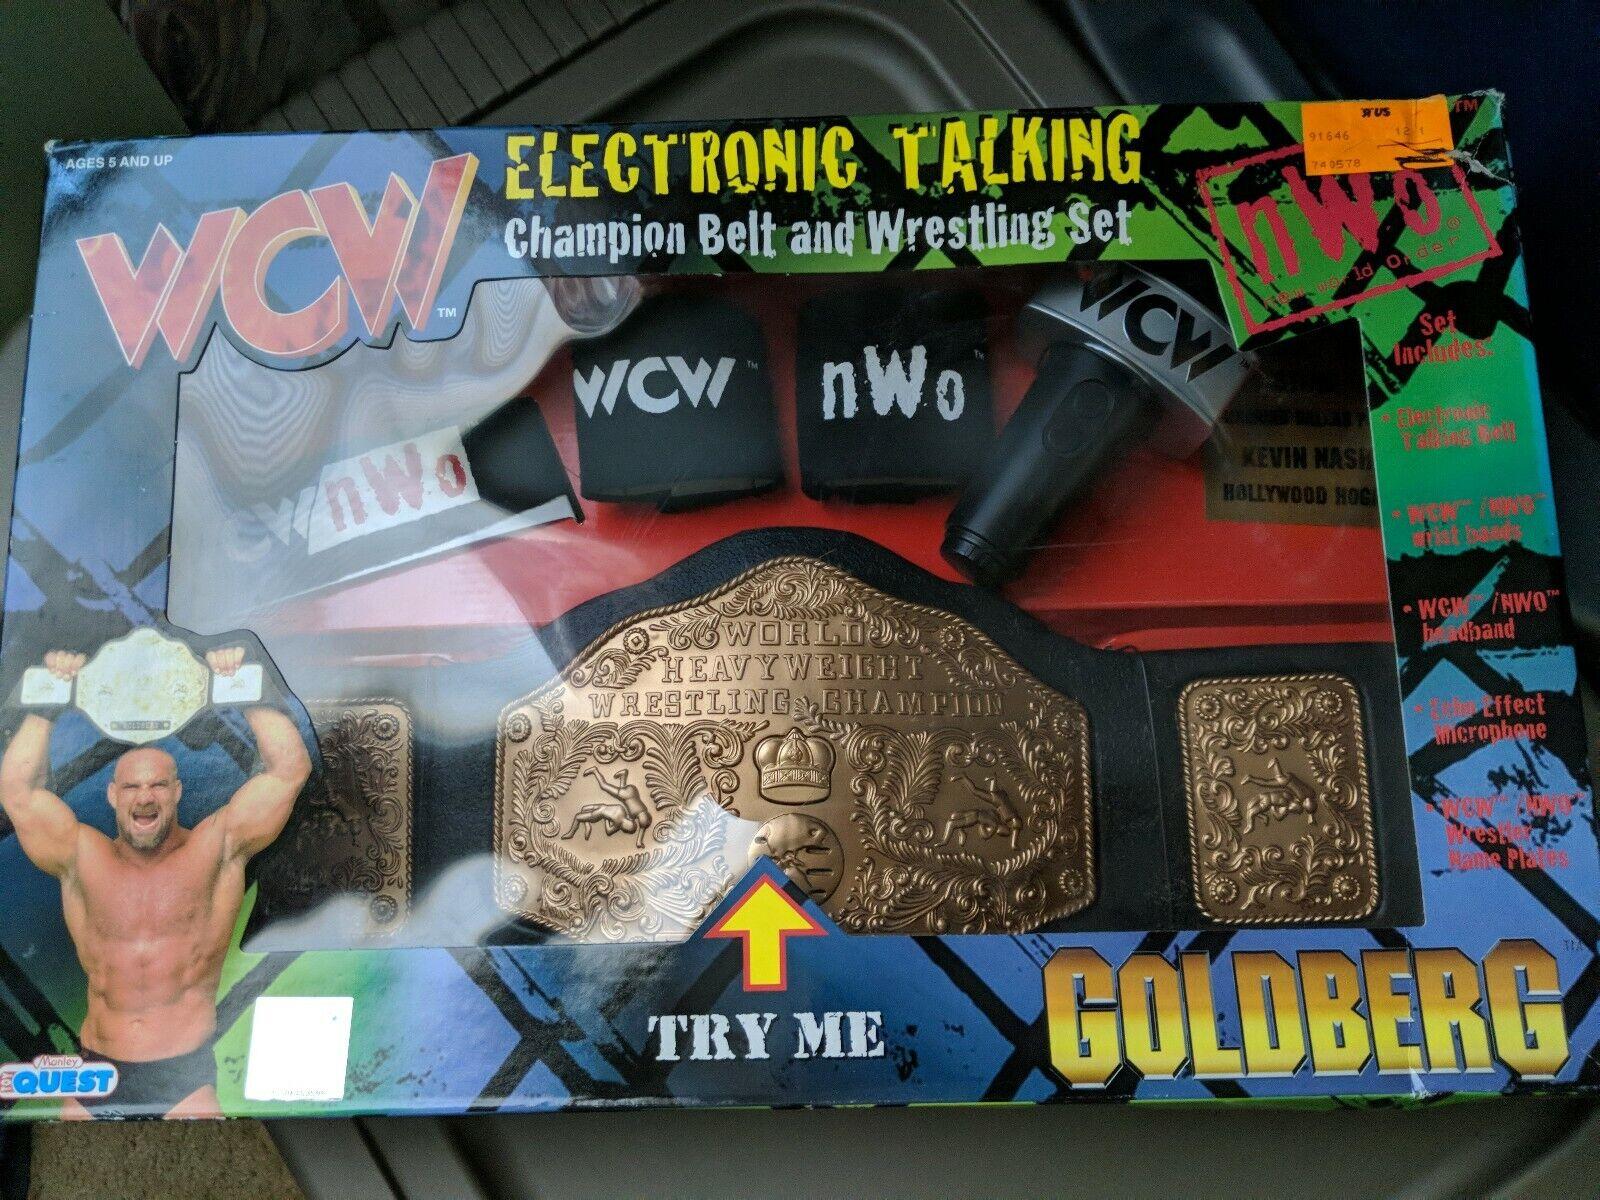 New New New WCW goldberg Electronic Talking HeavyWeight Wrestling Champion Belt 1998 8a1b04